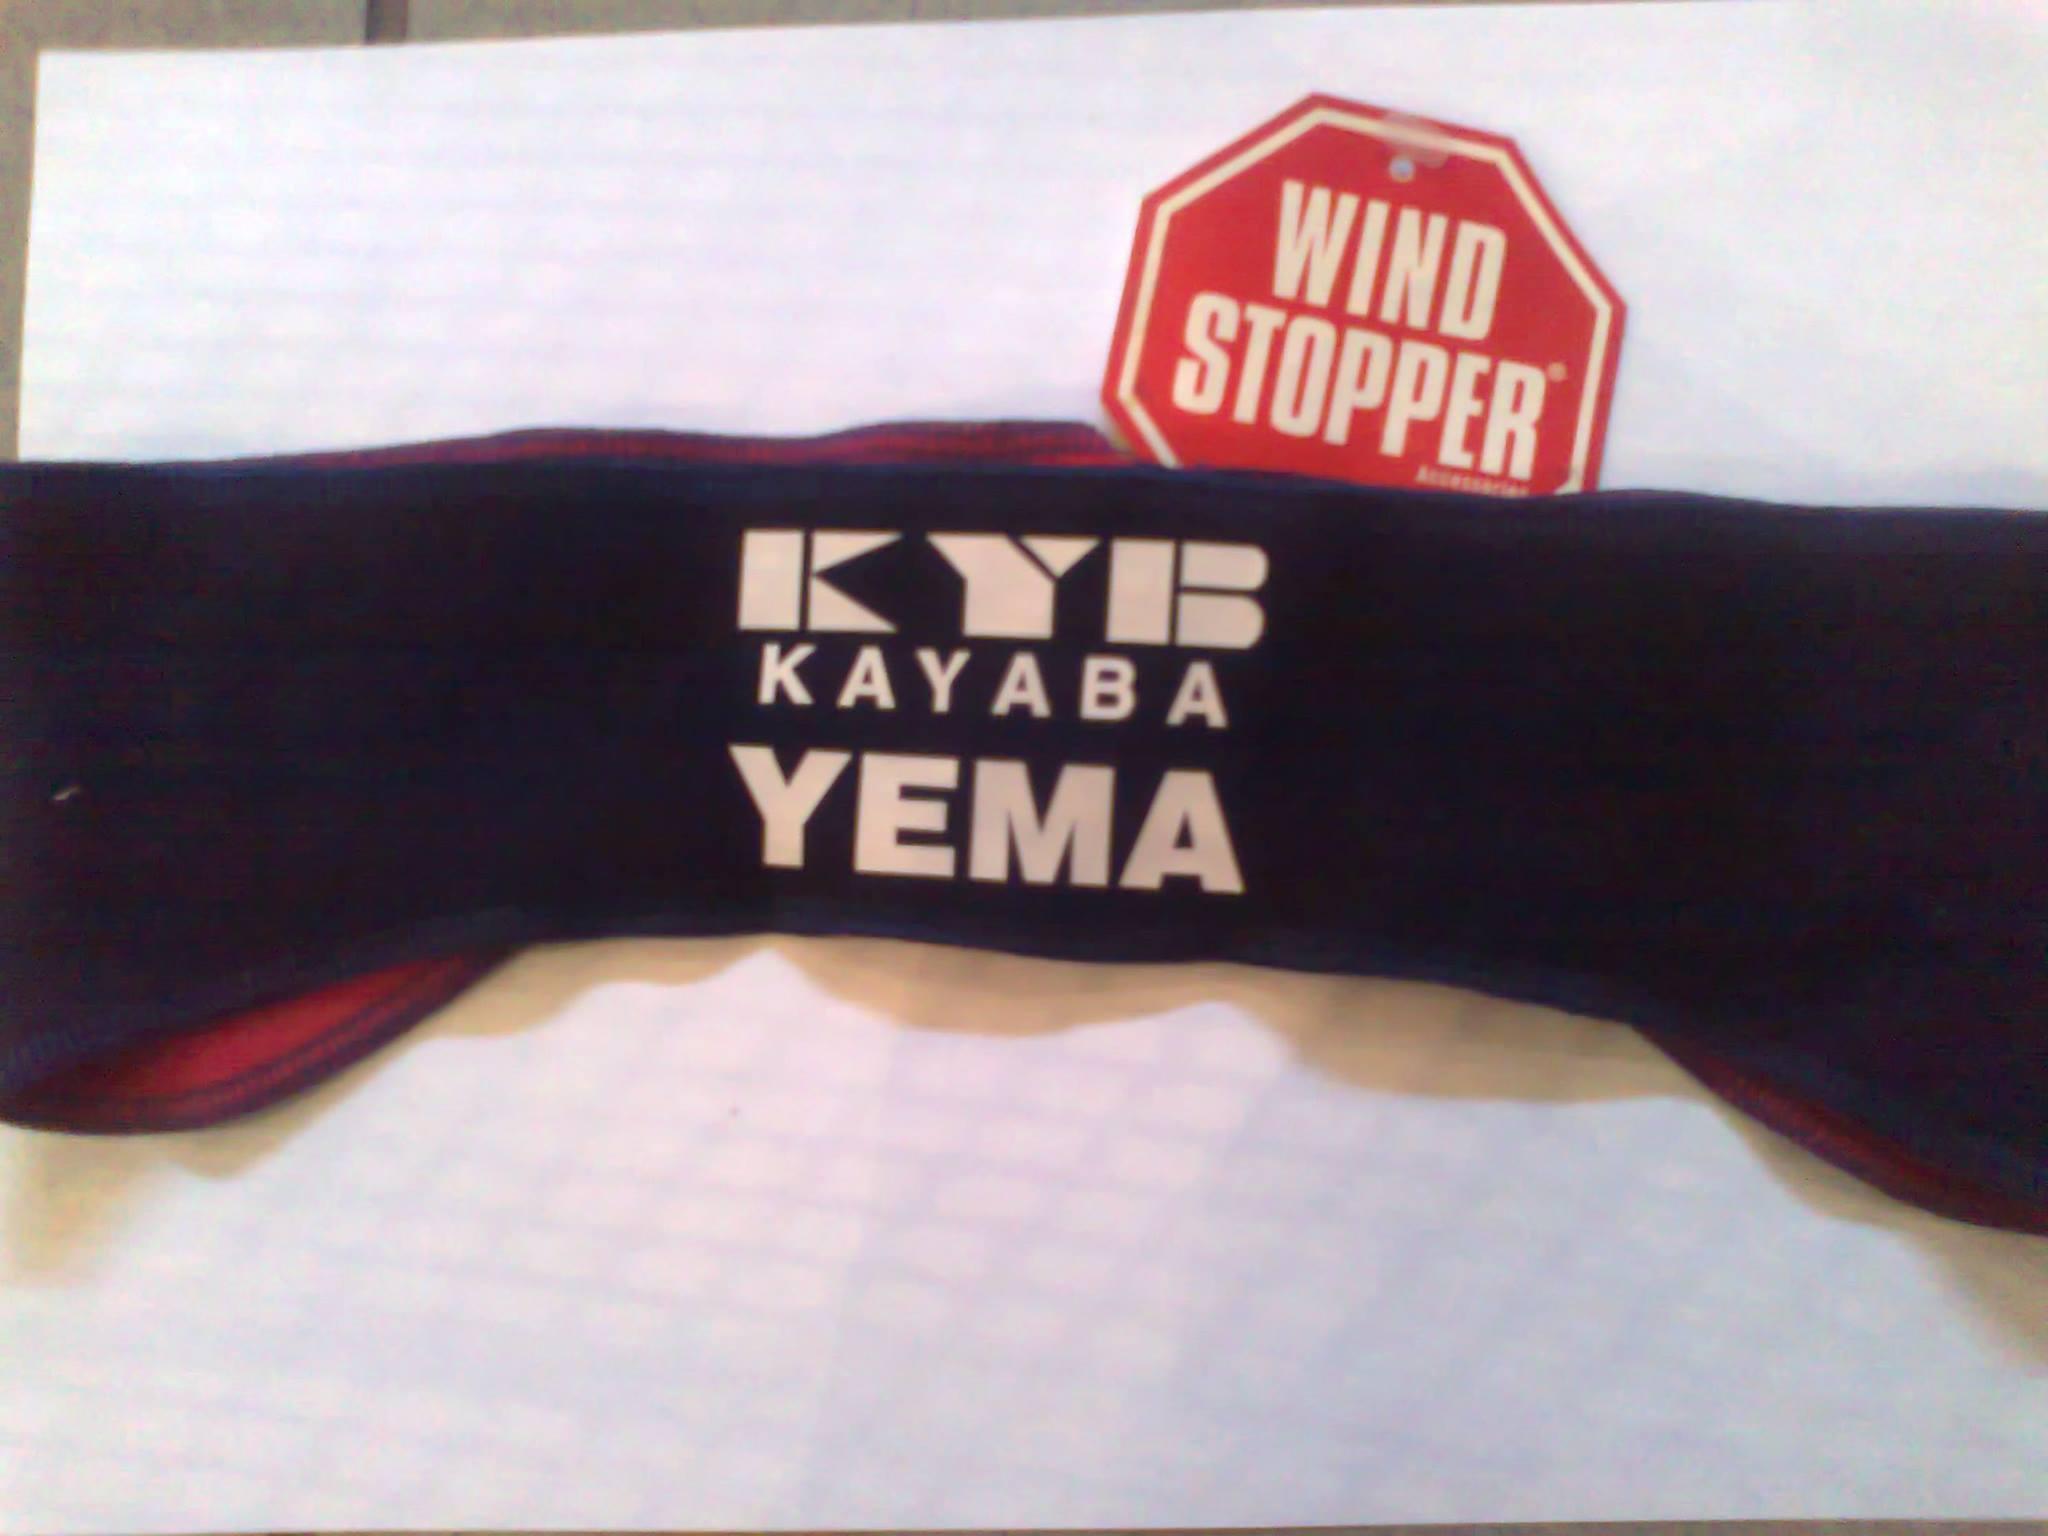 peapael-kyb-kayaba-yema-ws